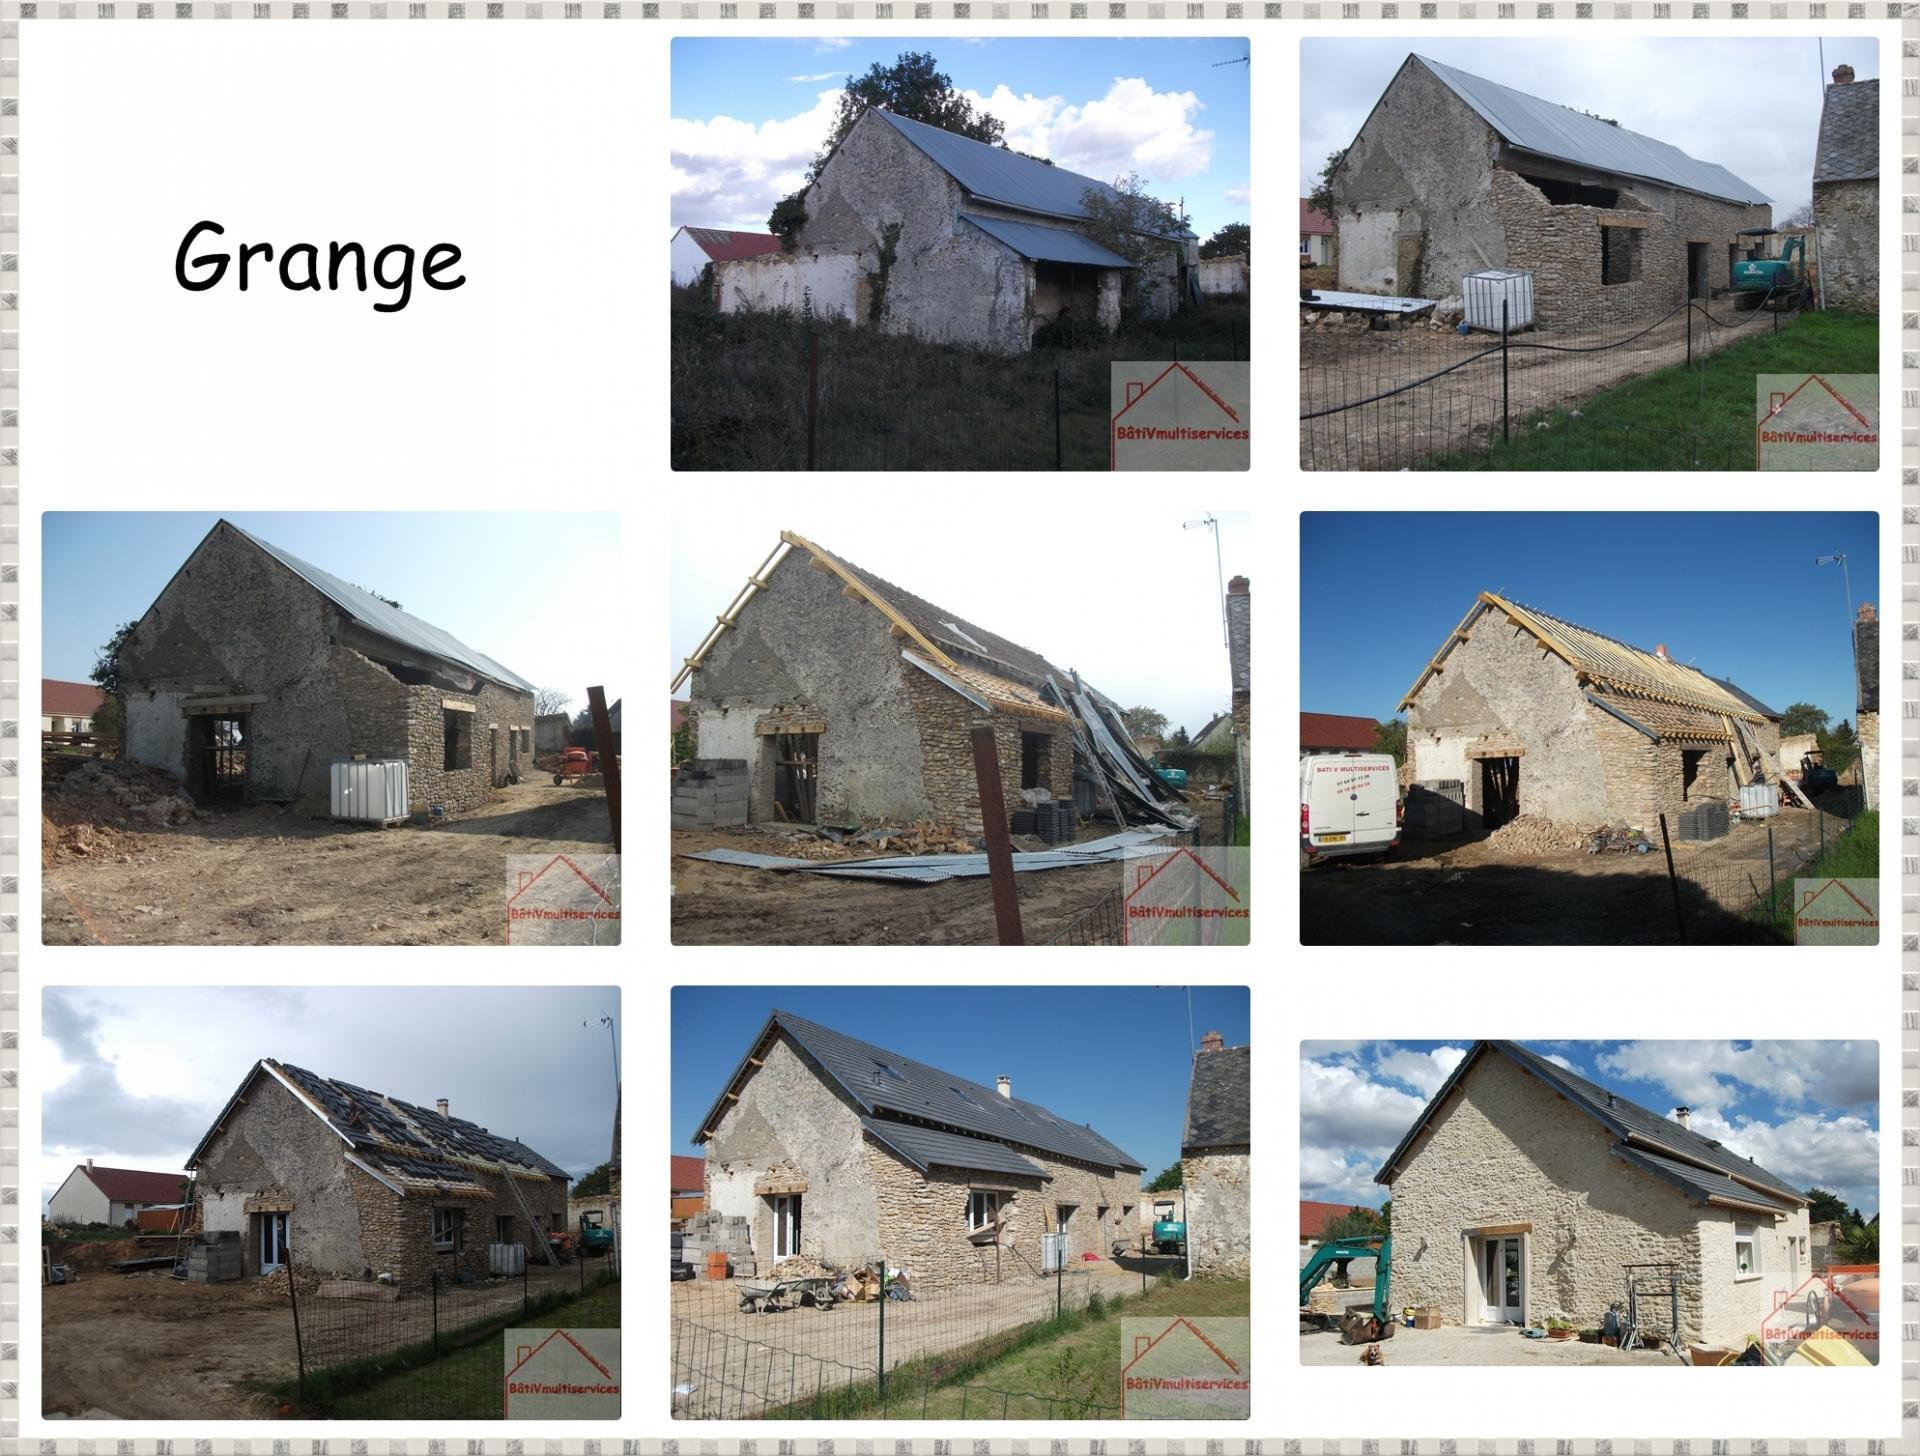 Grange 5